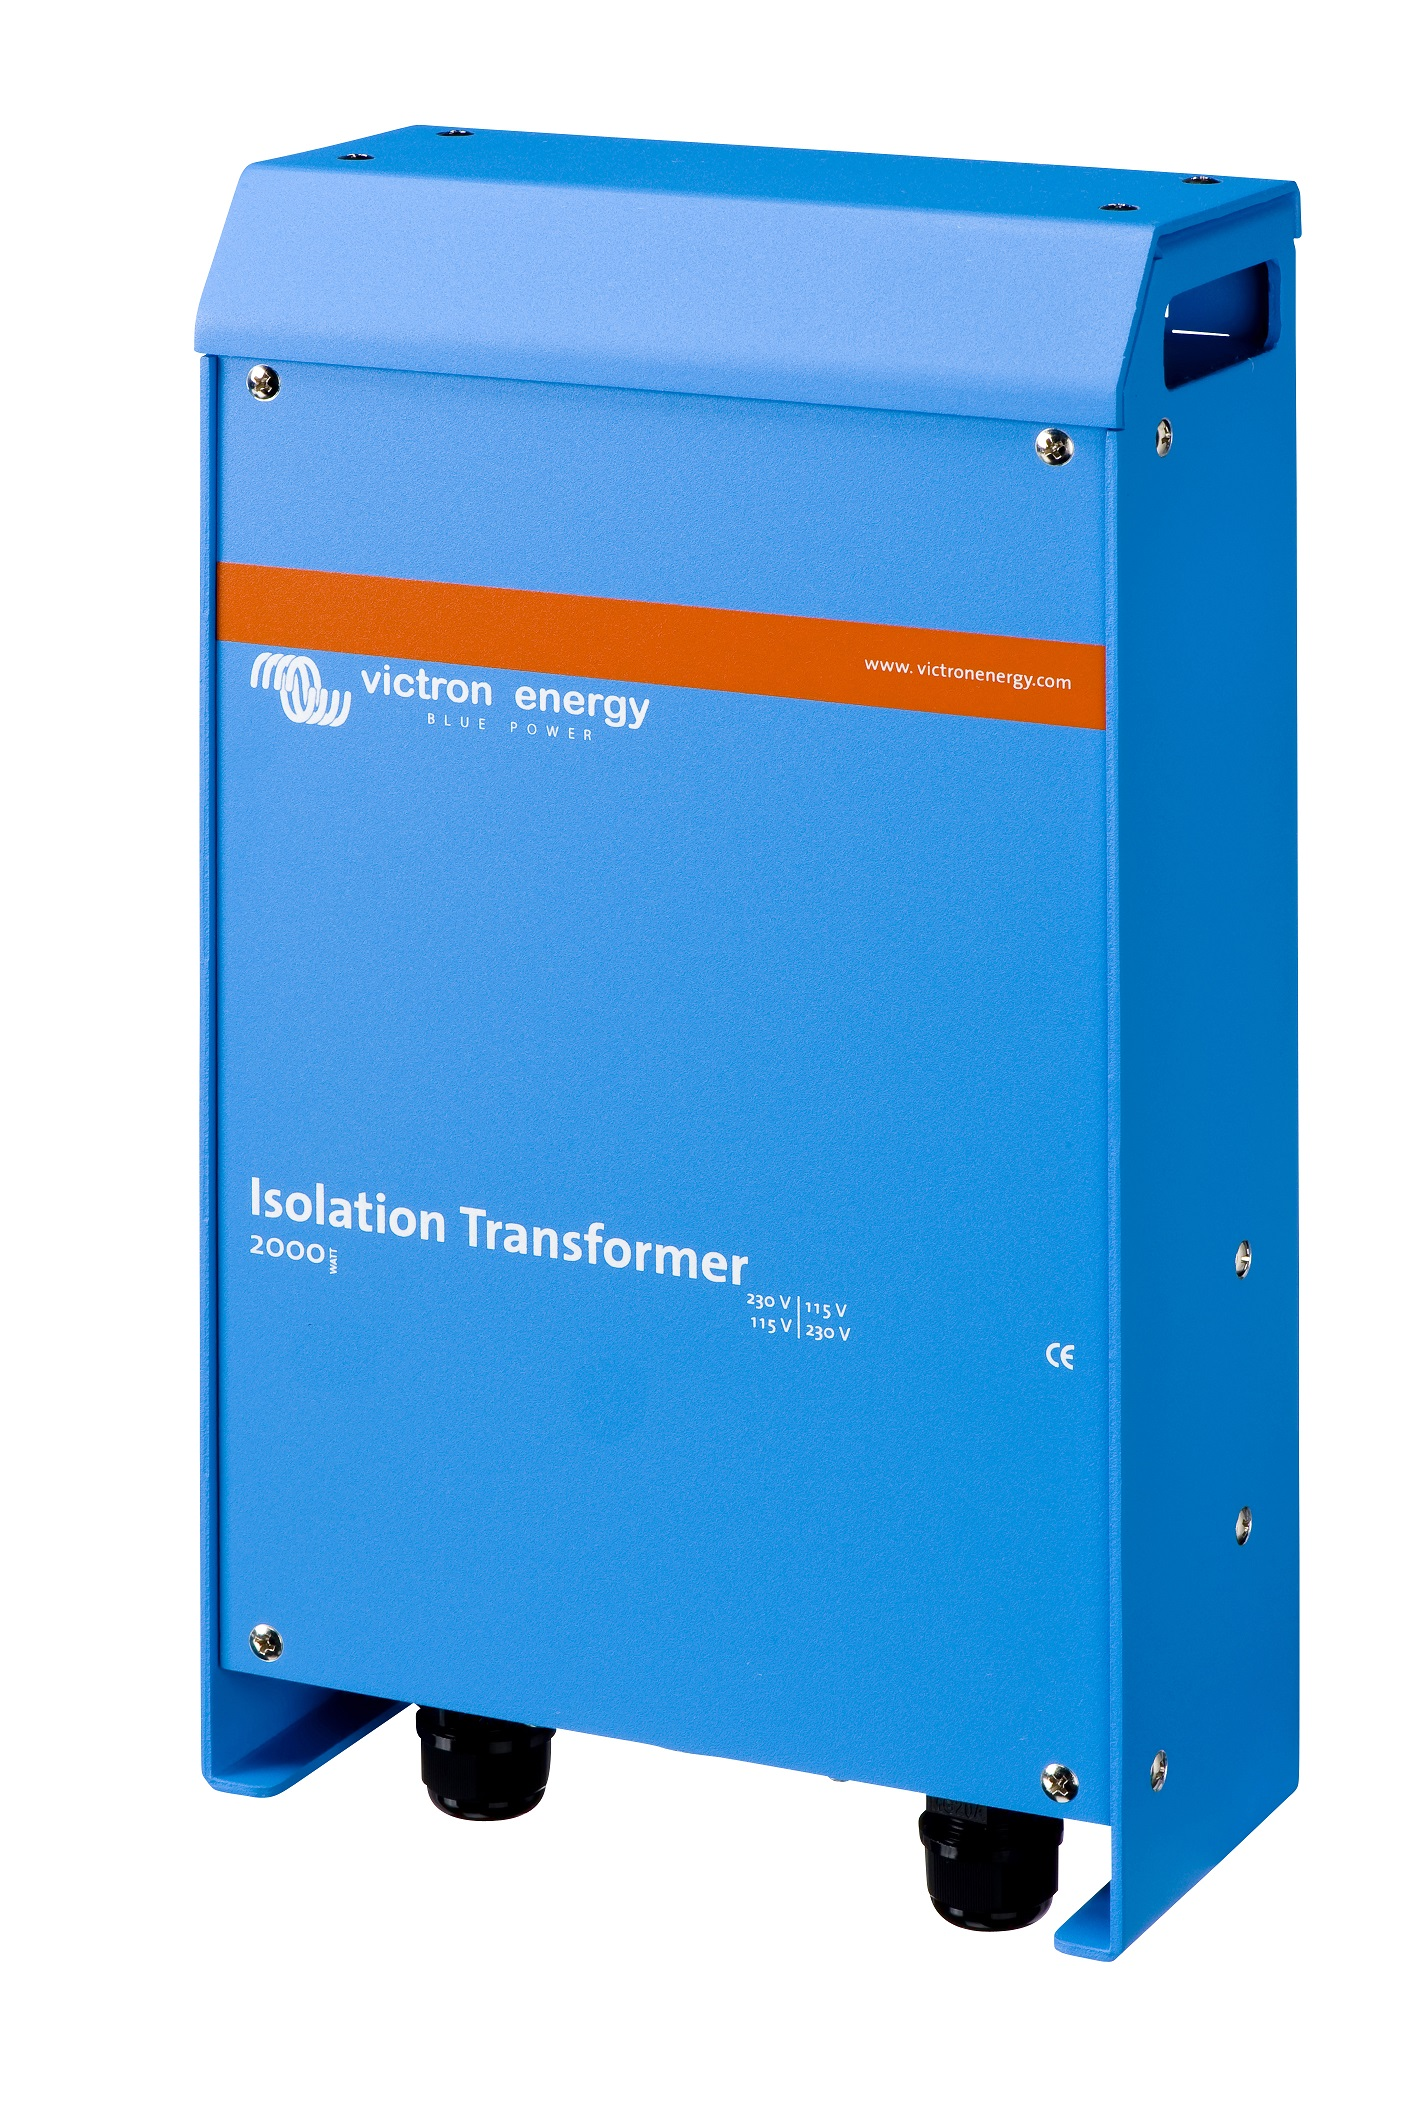 Isolation_Transformer_2000W_left_ITR040202040